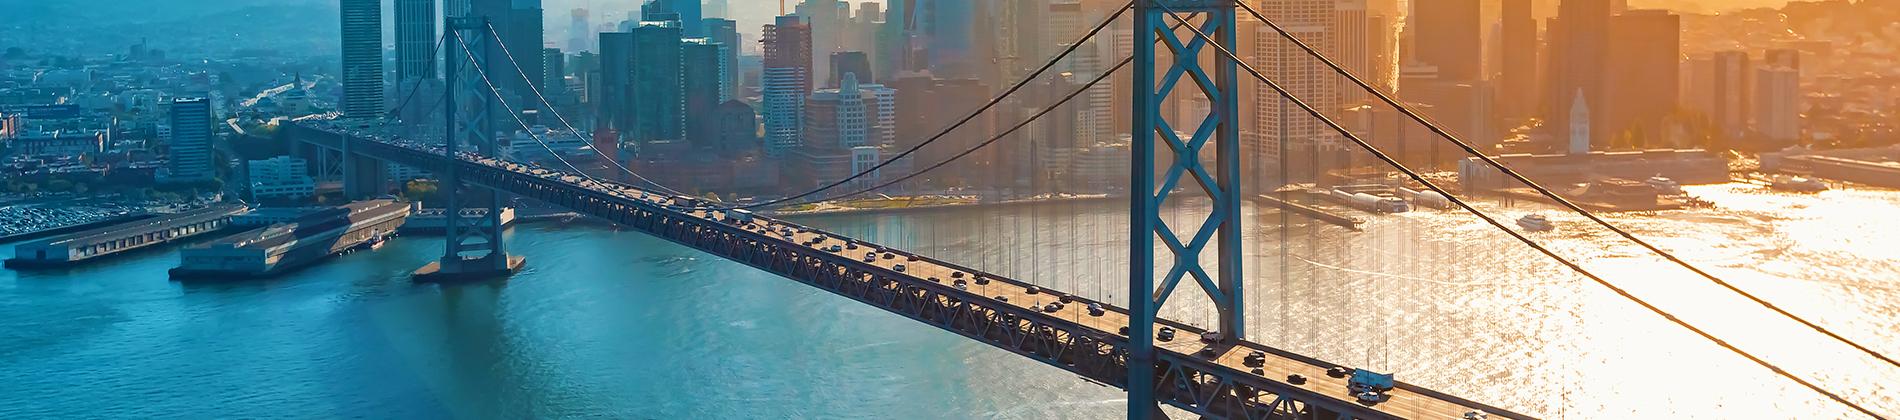 San Francisco Bridge with Heavy Traffic